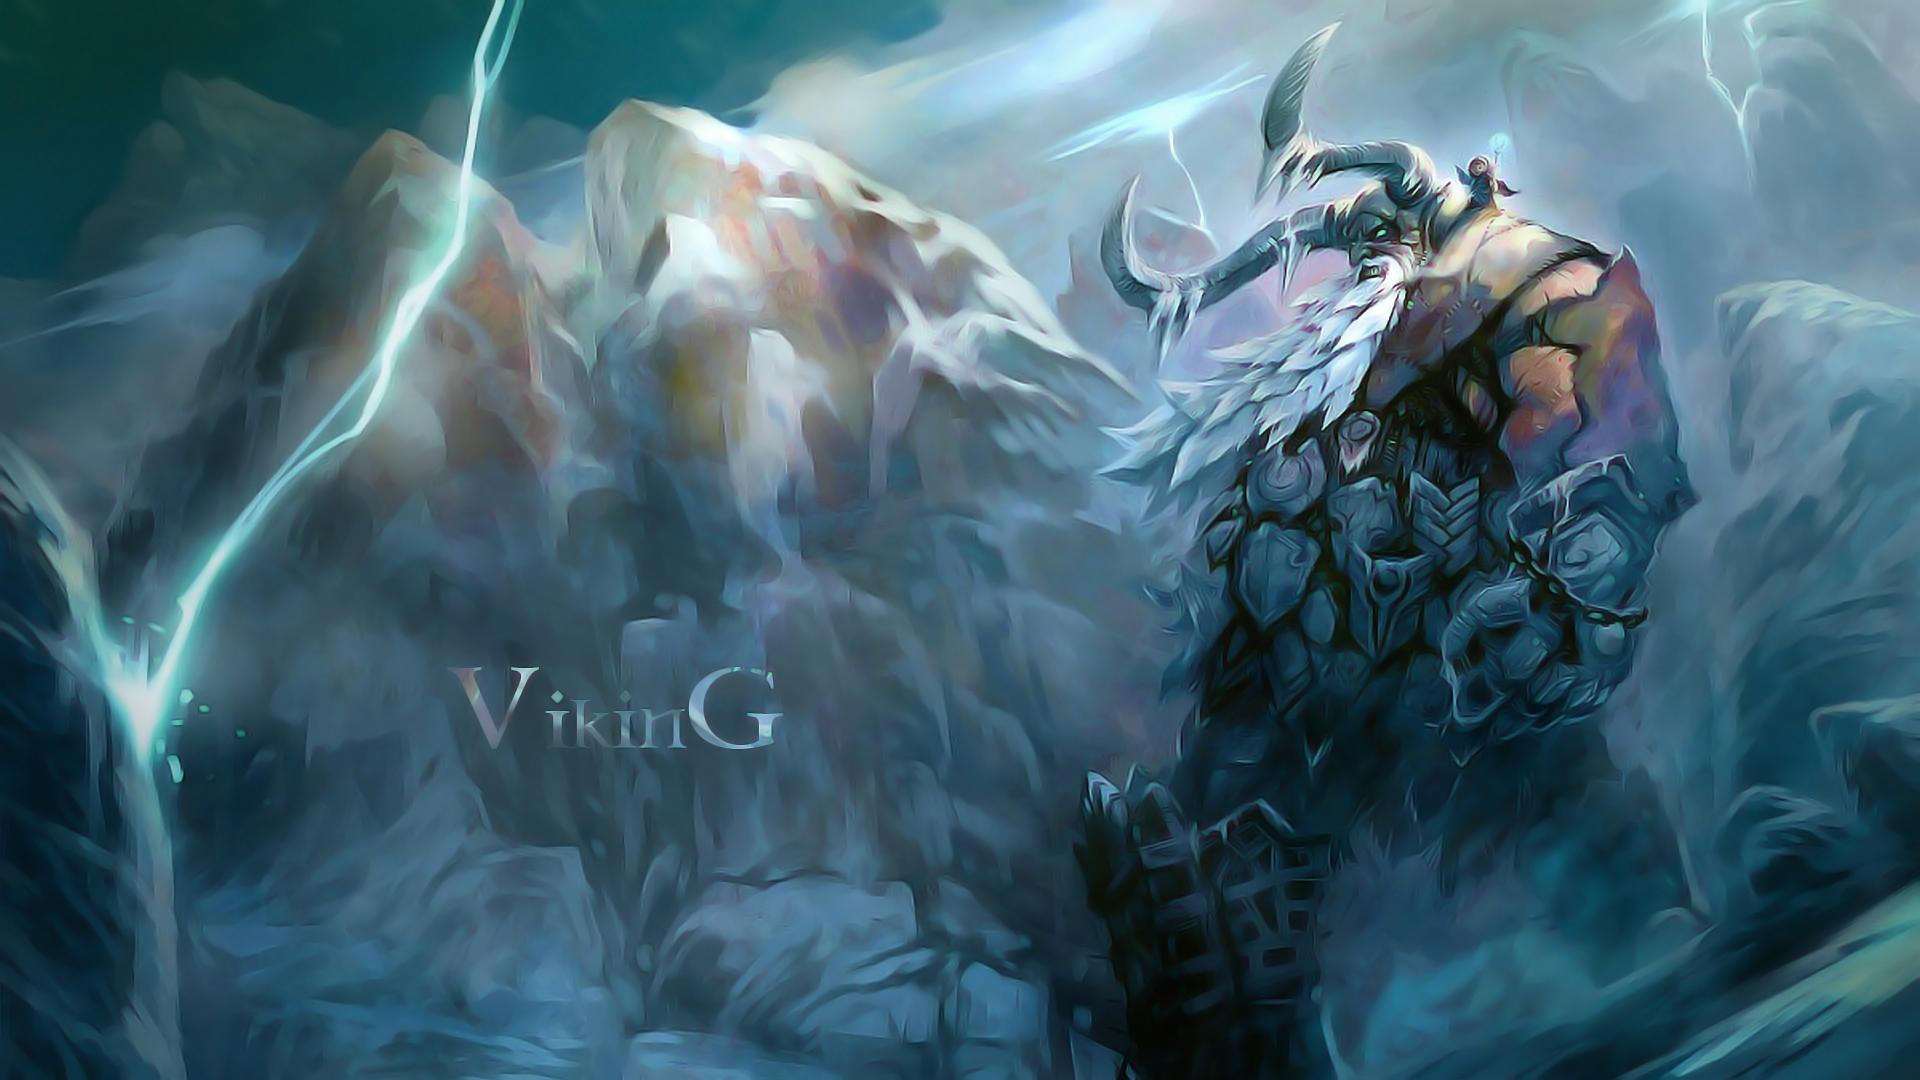 wallpaper viking wallpapers - photo #16